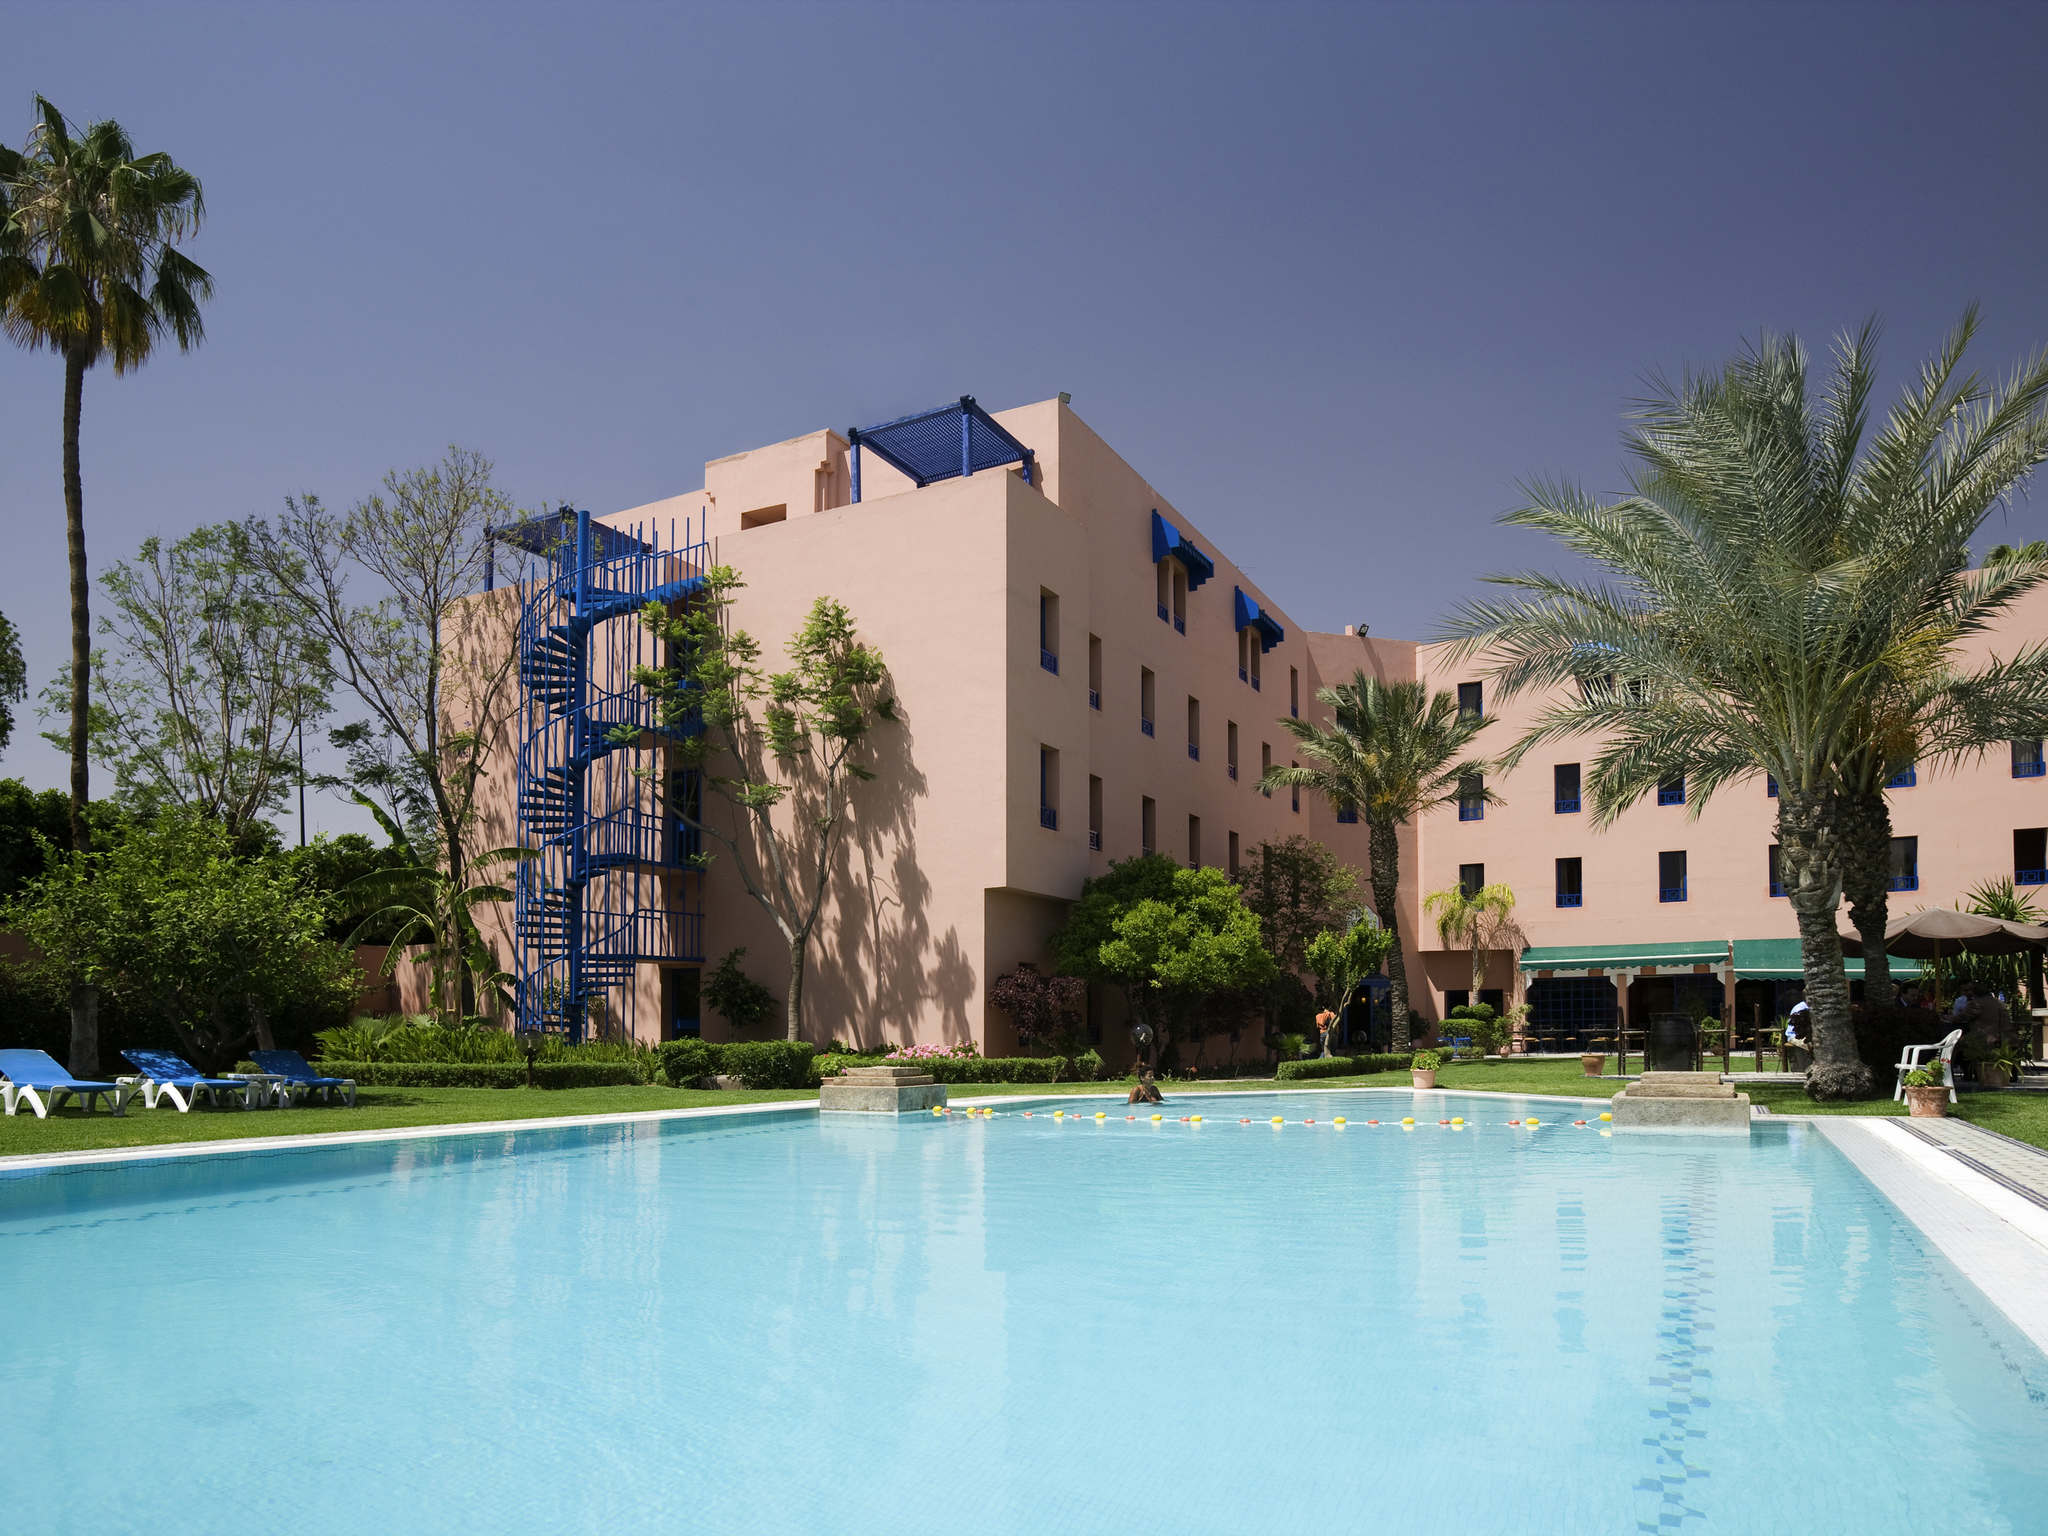 Hotel in marrakech ibis marrakech centre gare for Hotels marrakech